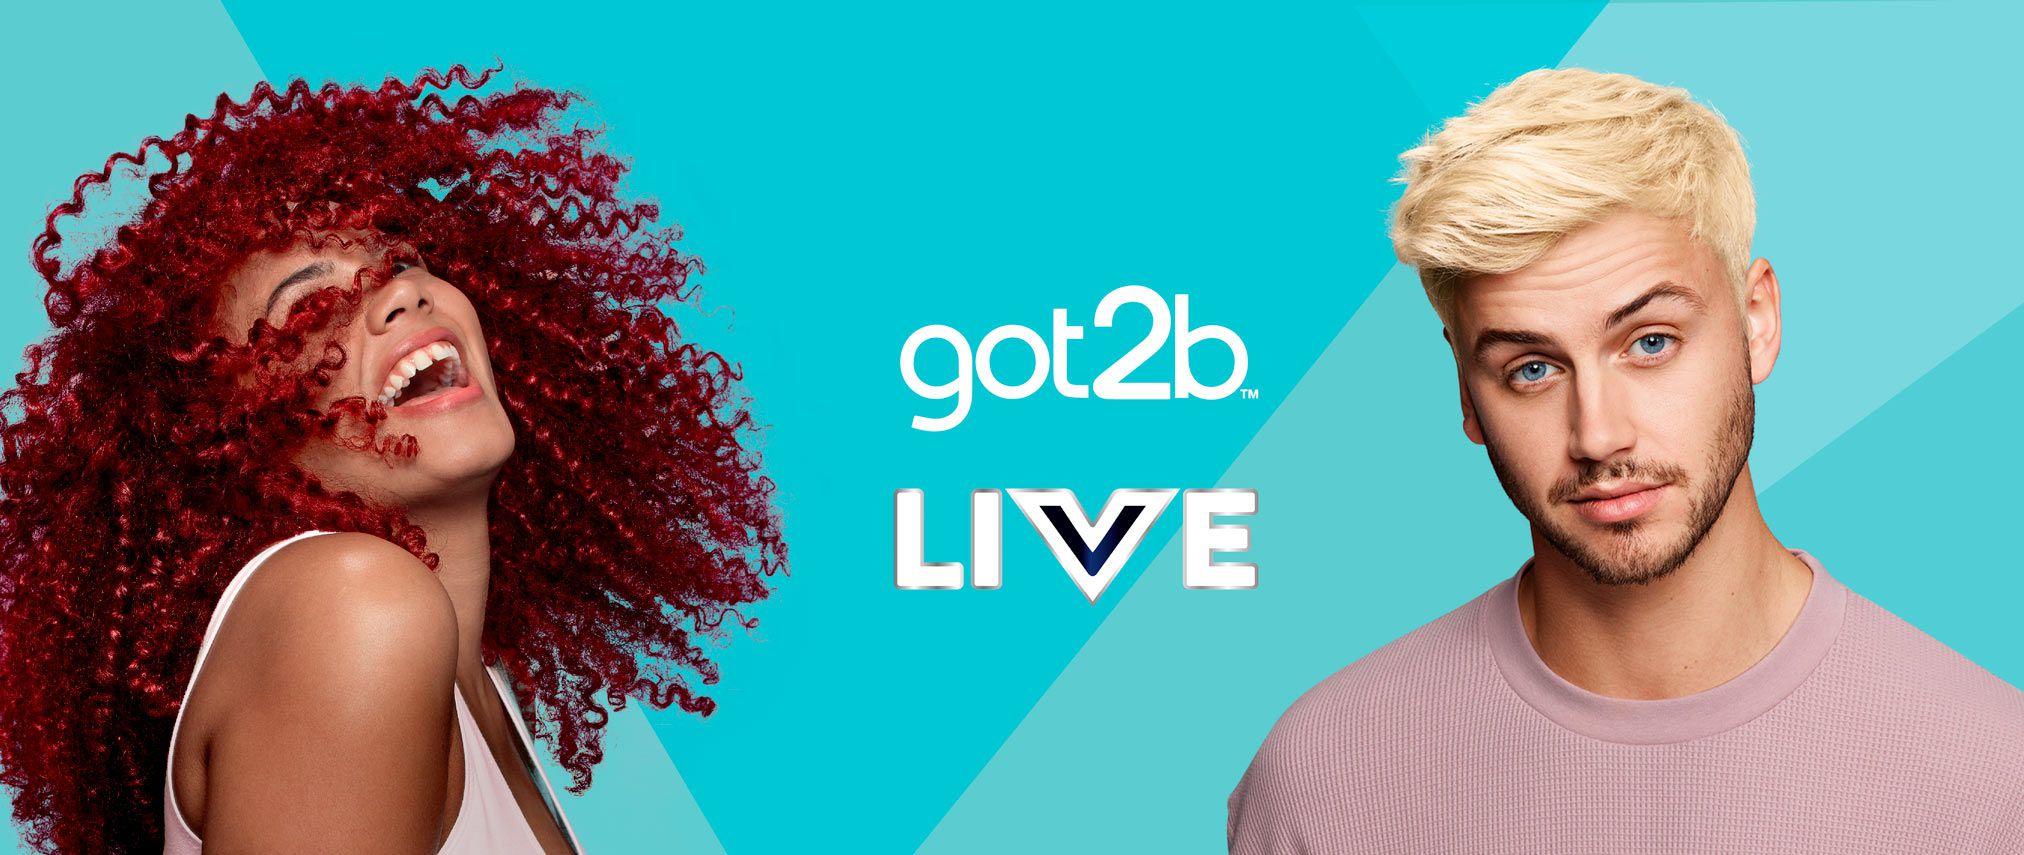 got2 live